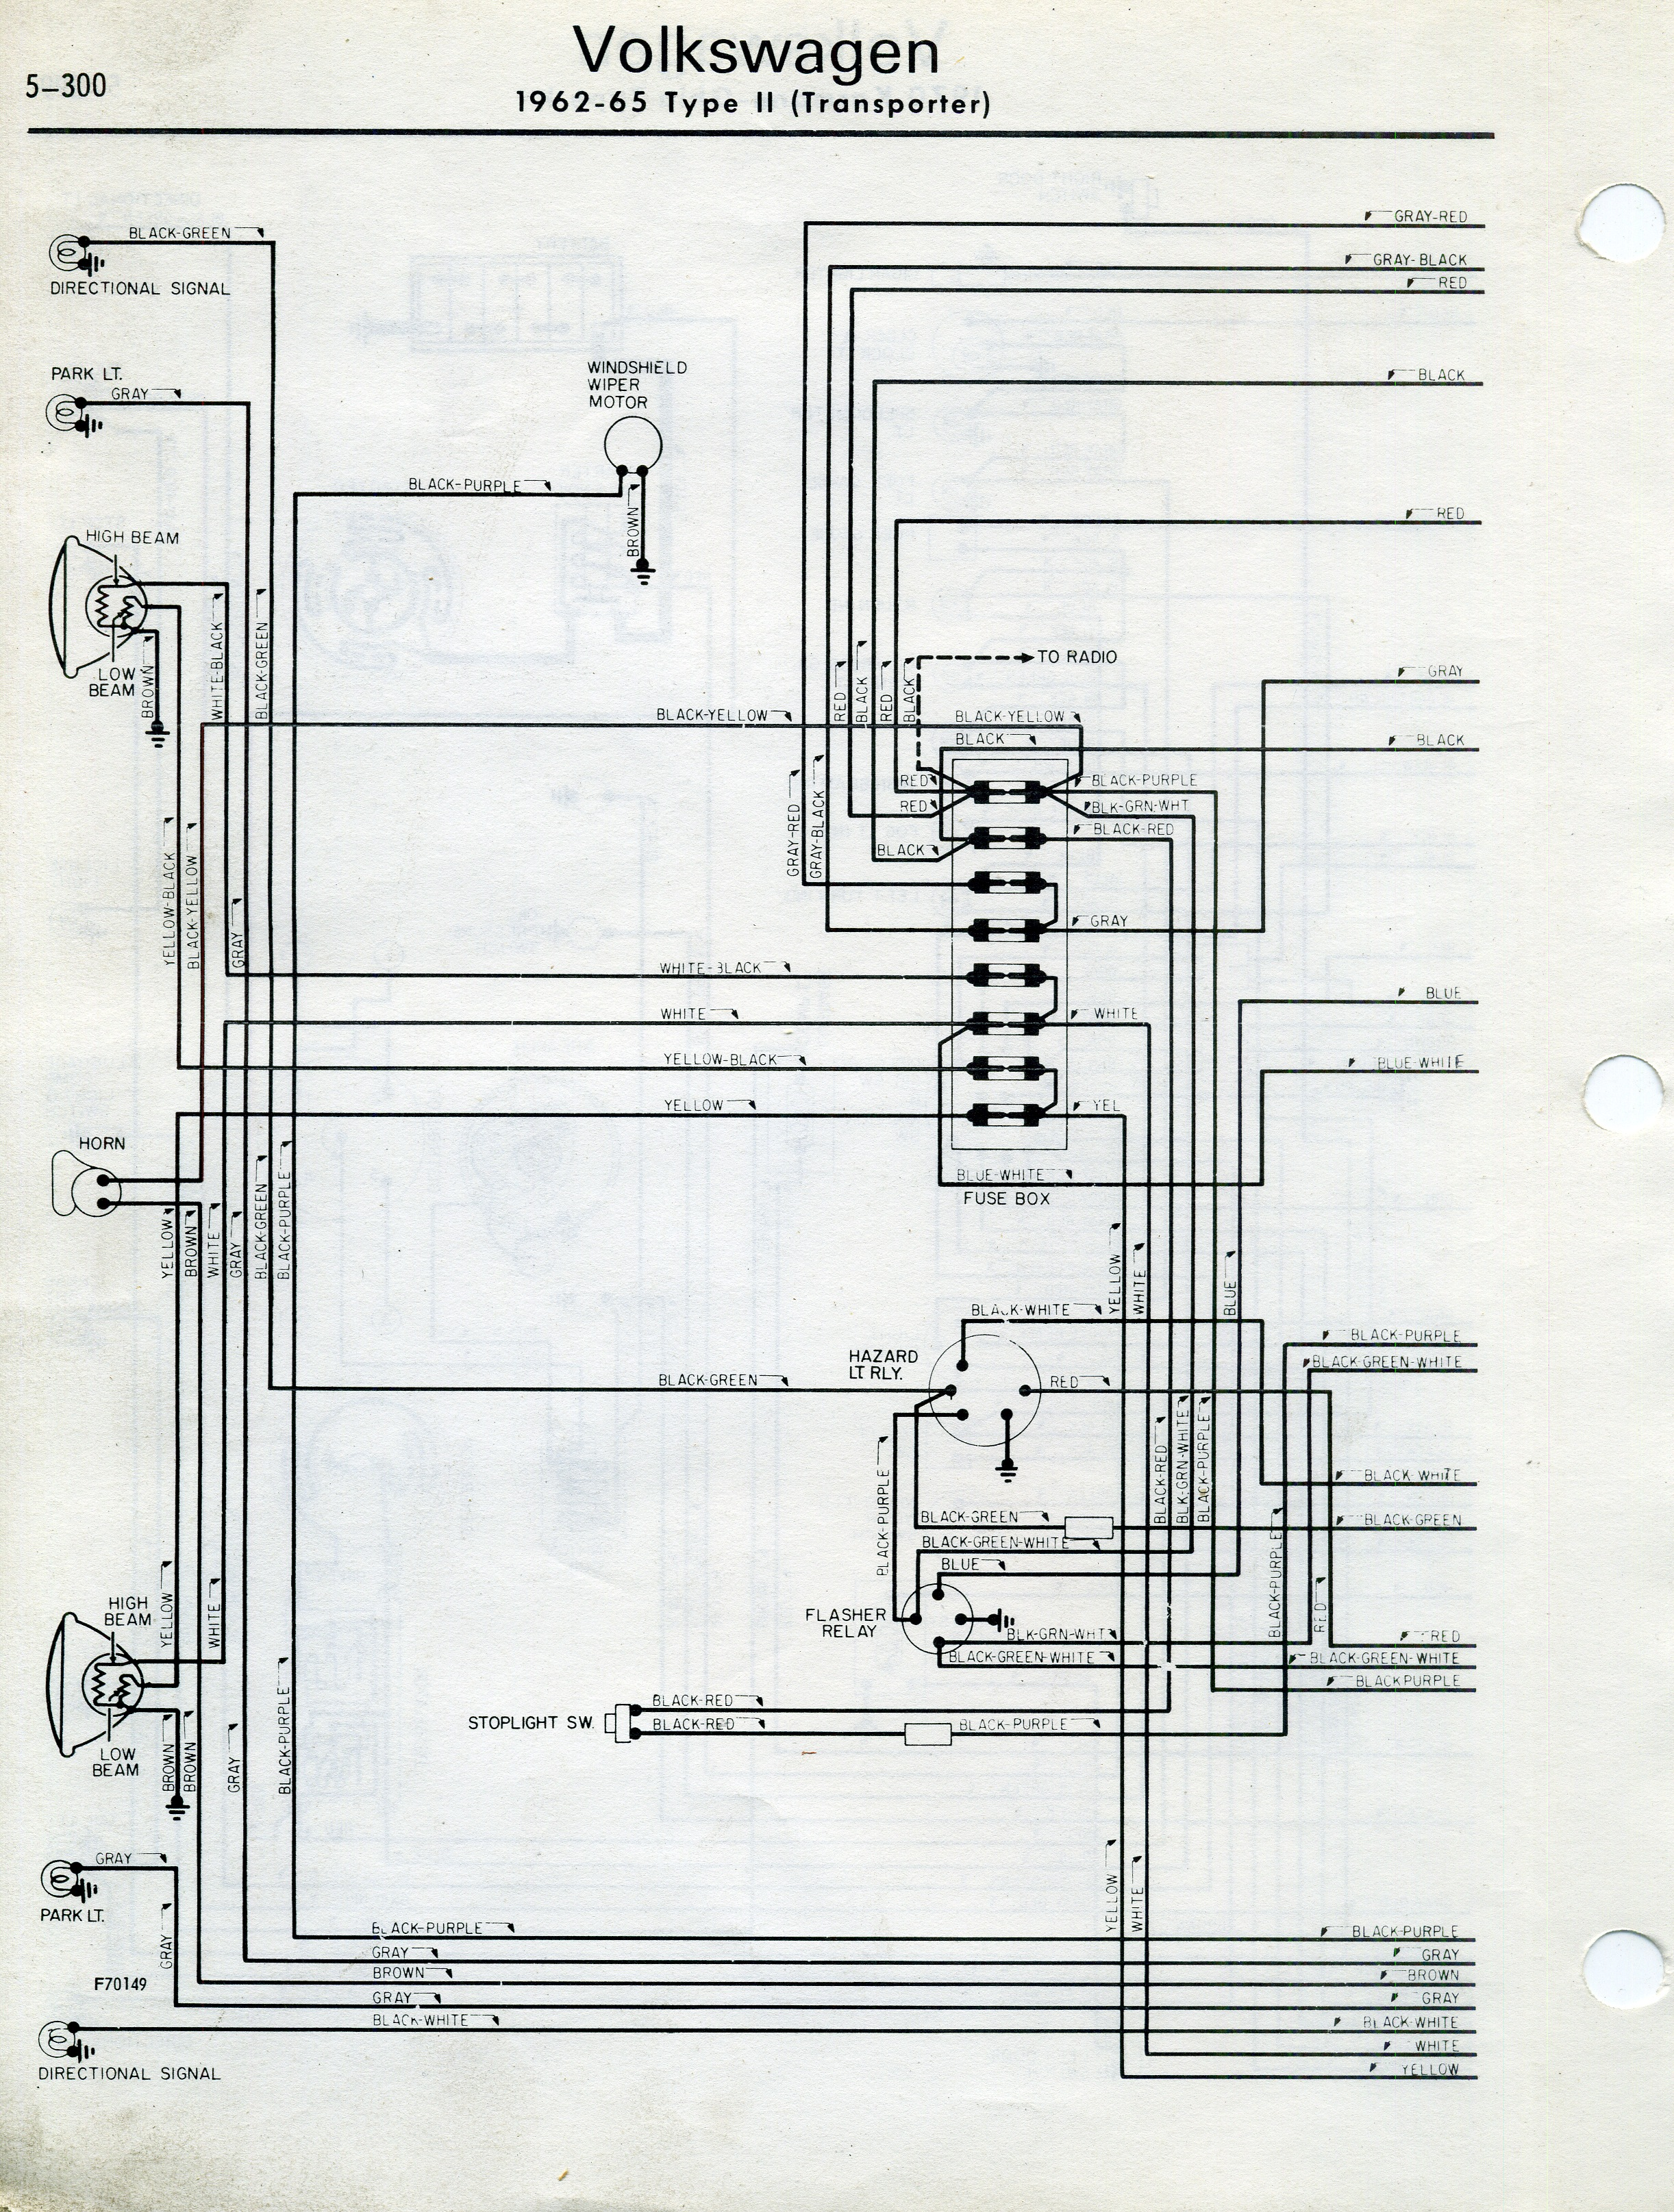 wiring diagram for 1968 vw transporter